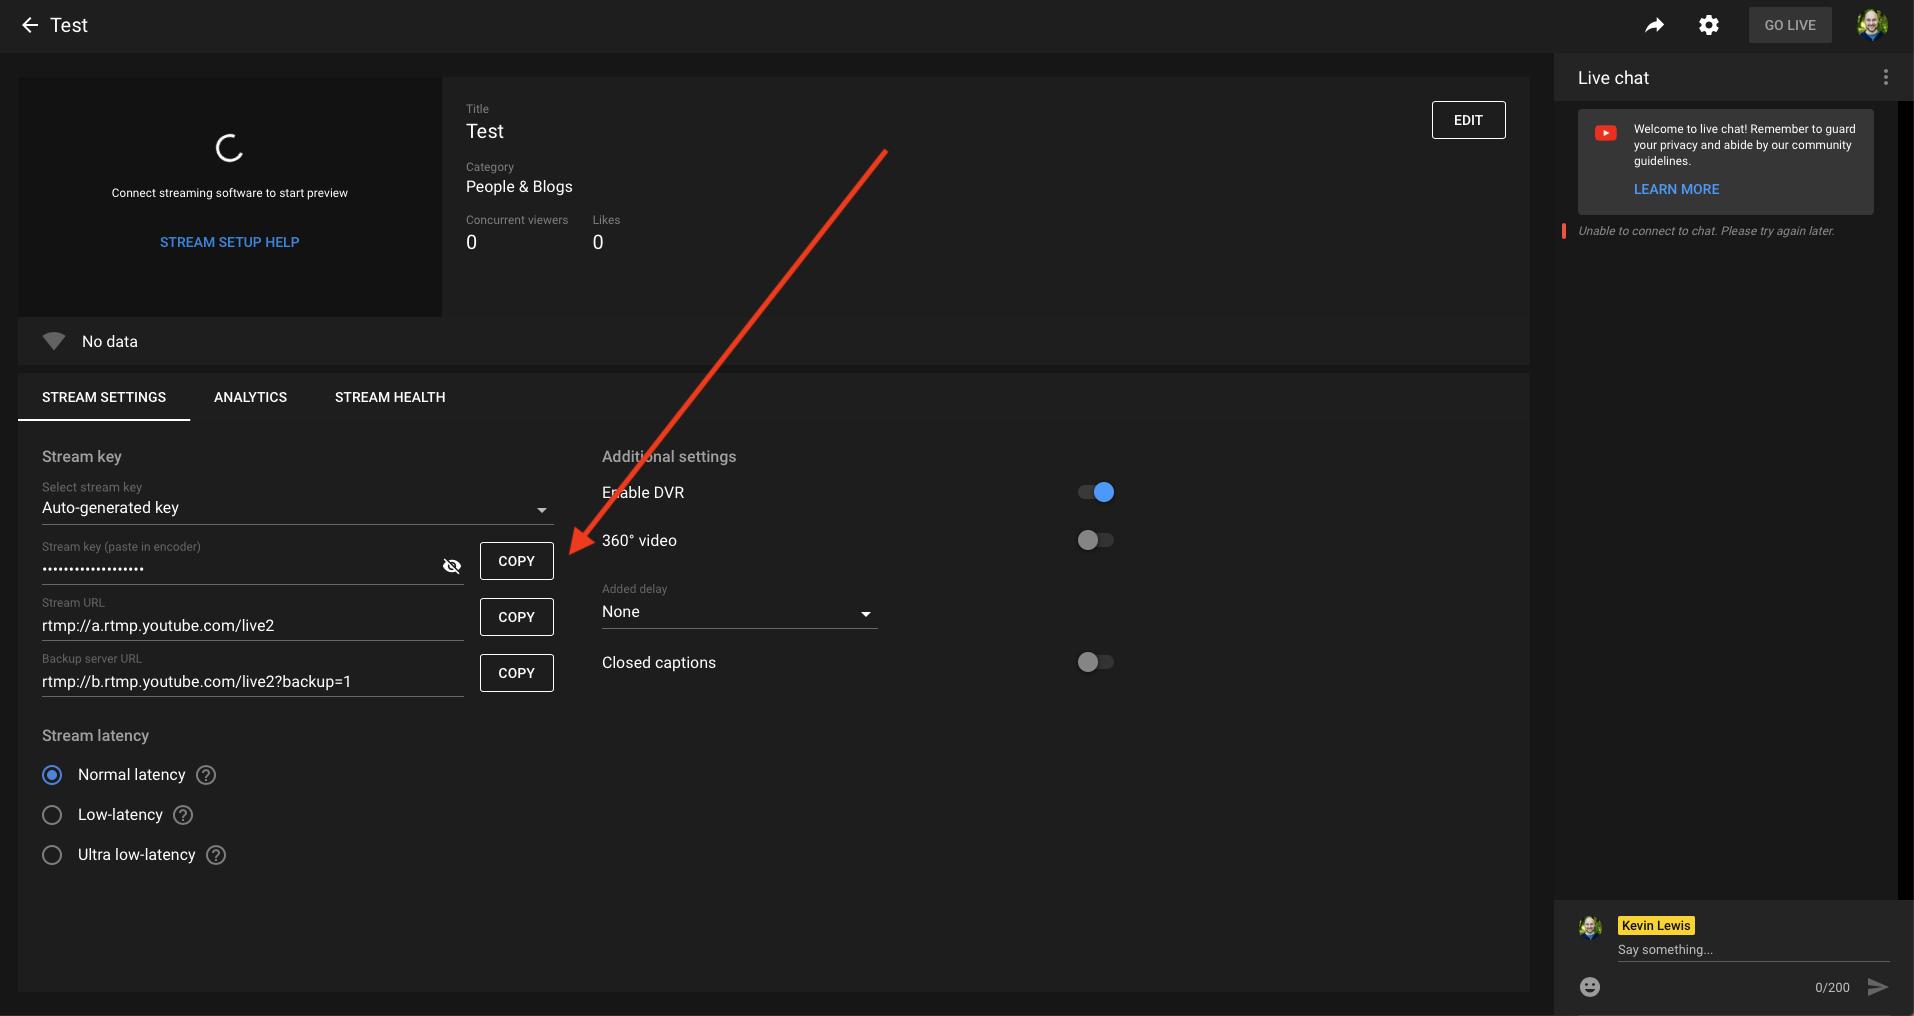 Stream key location